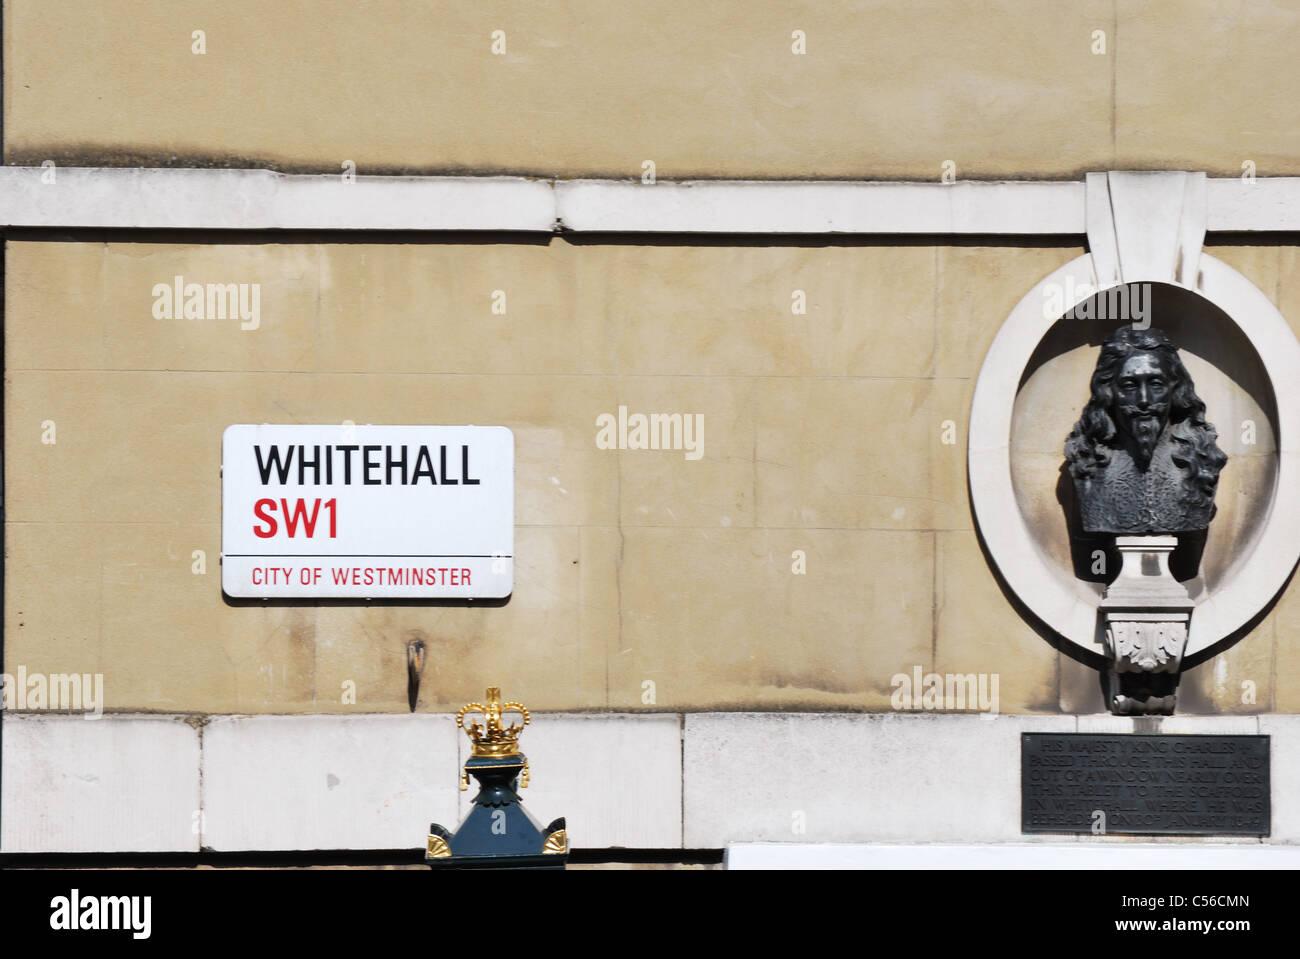 Whitehall street sign - Stock Image